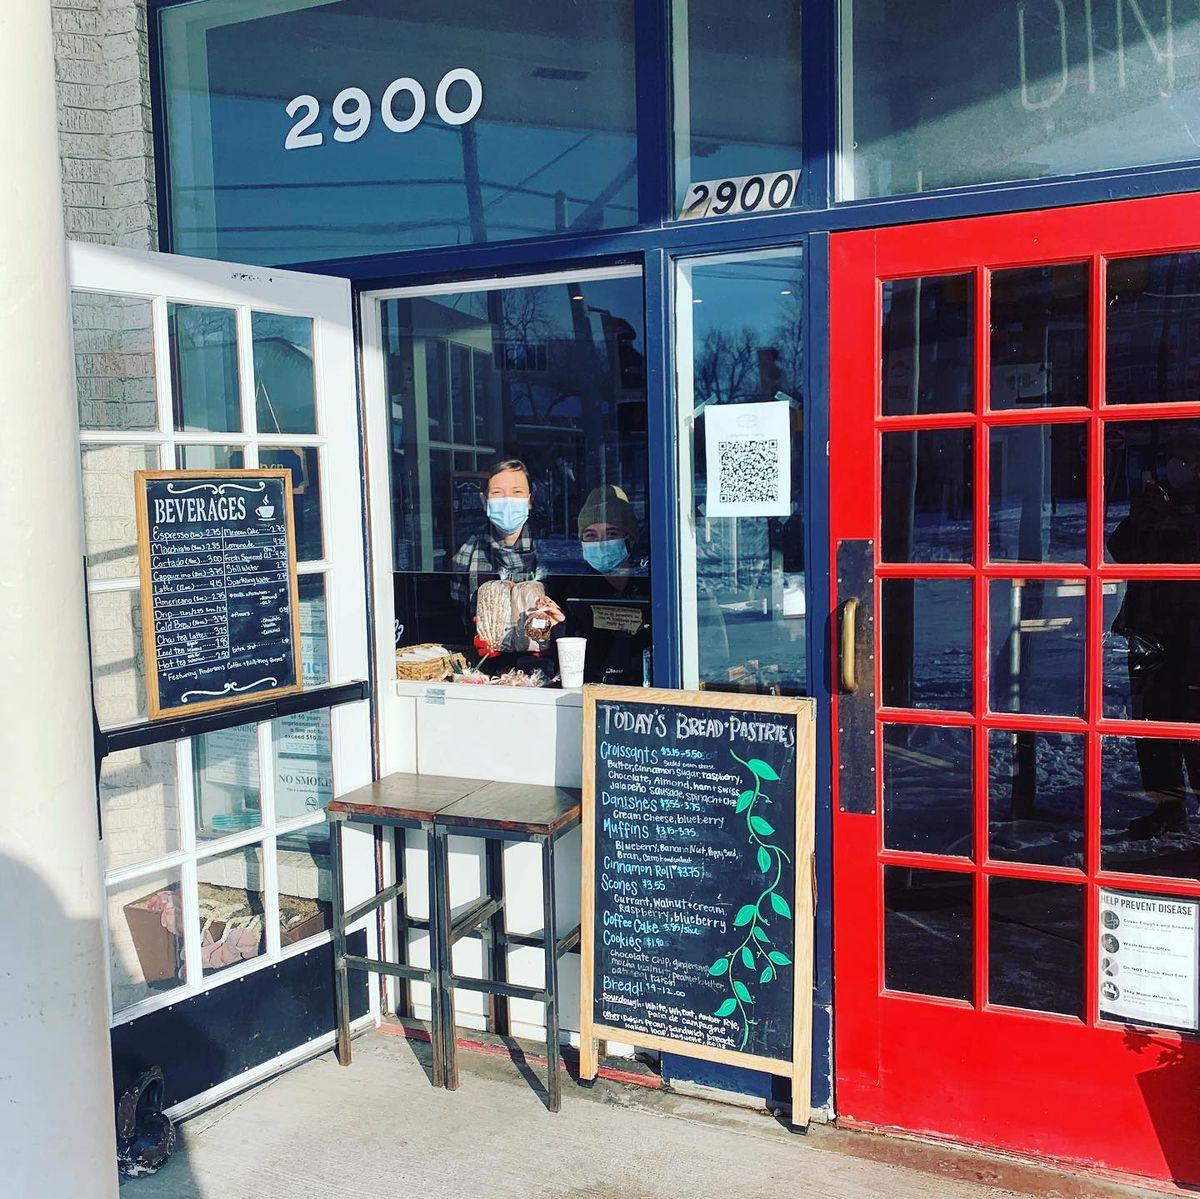 Texas French Bread's walkup window